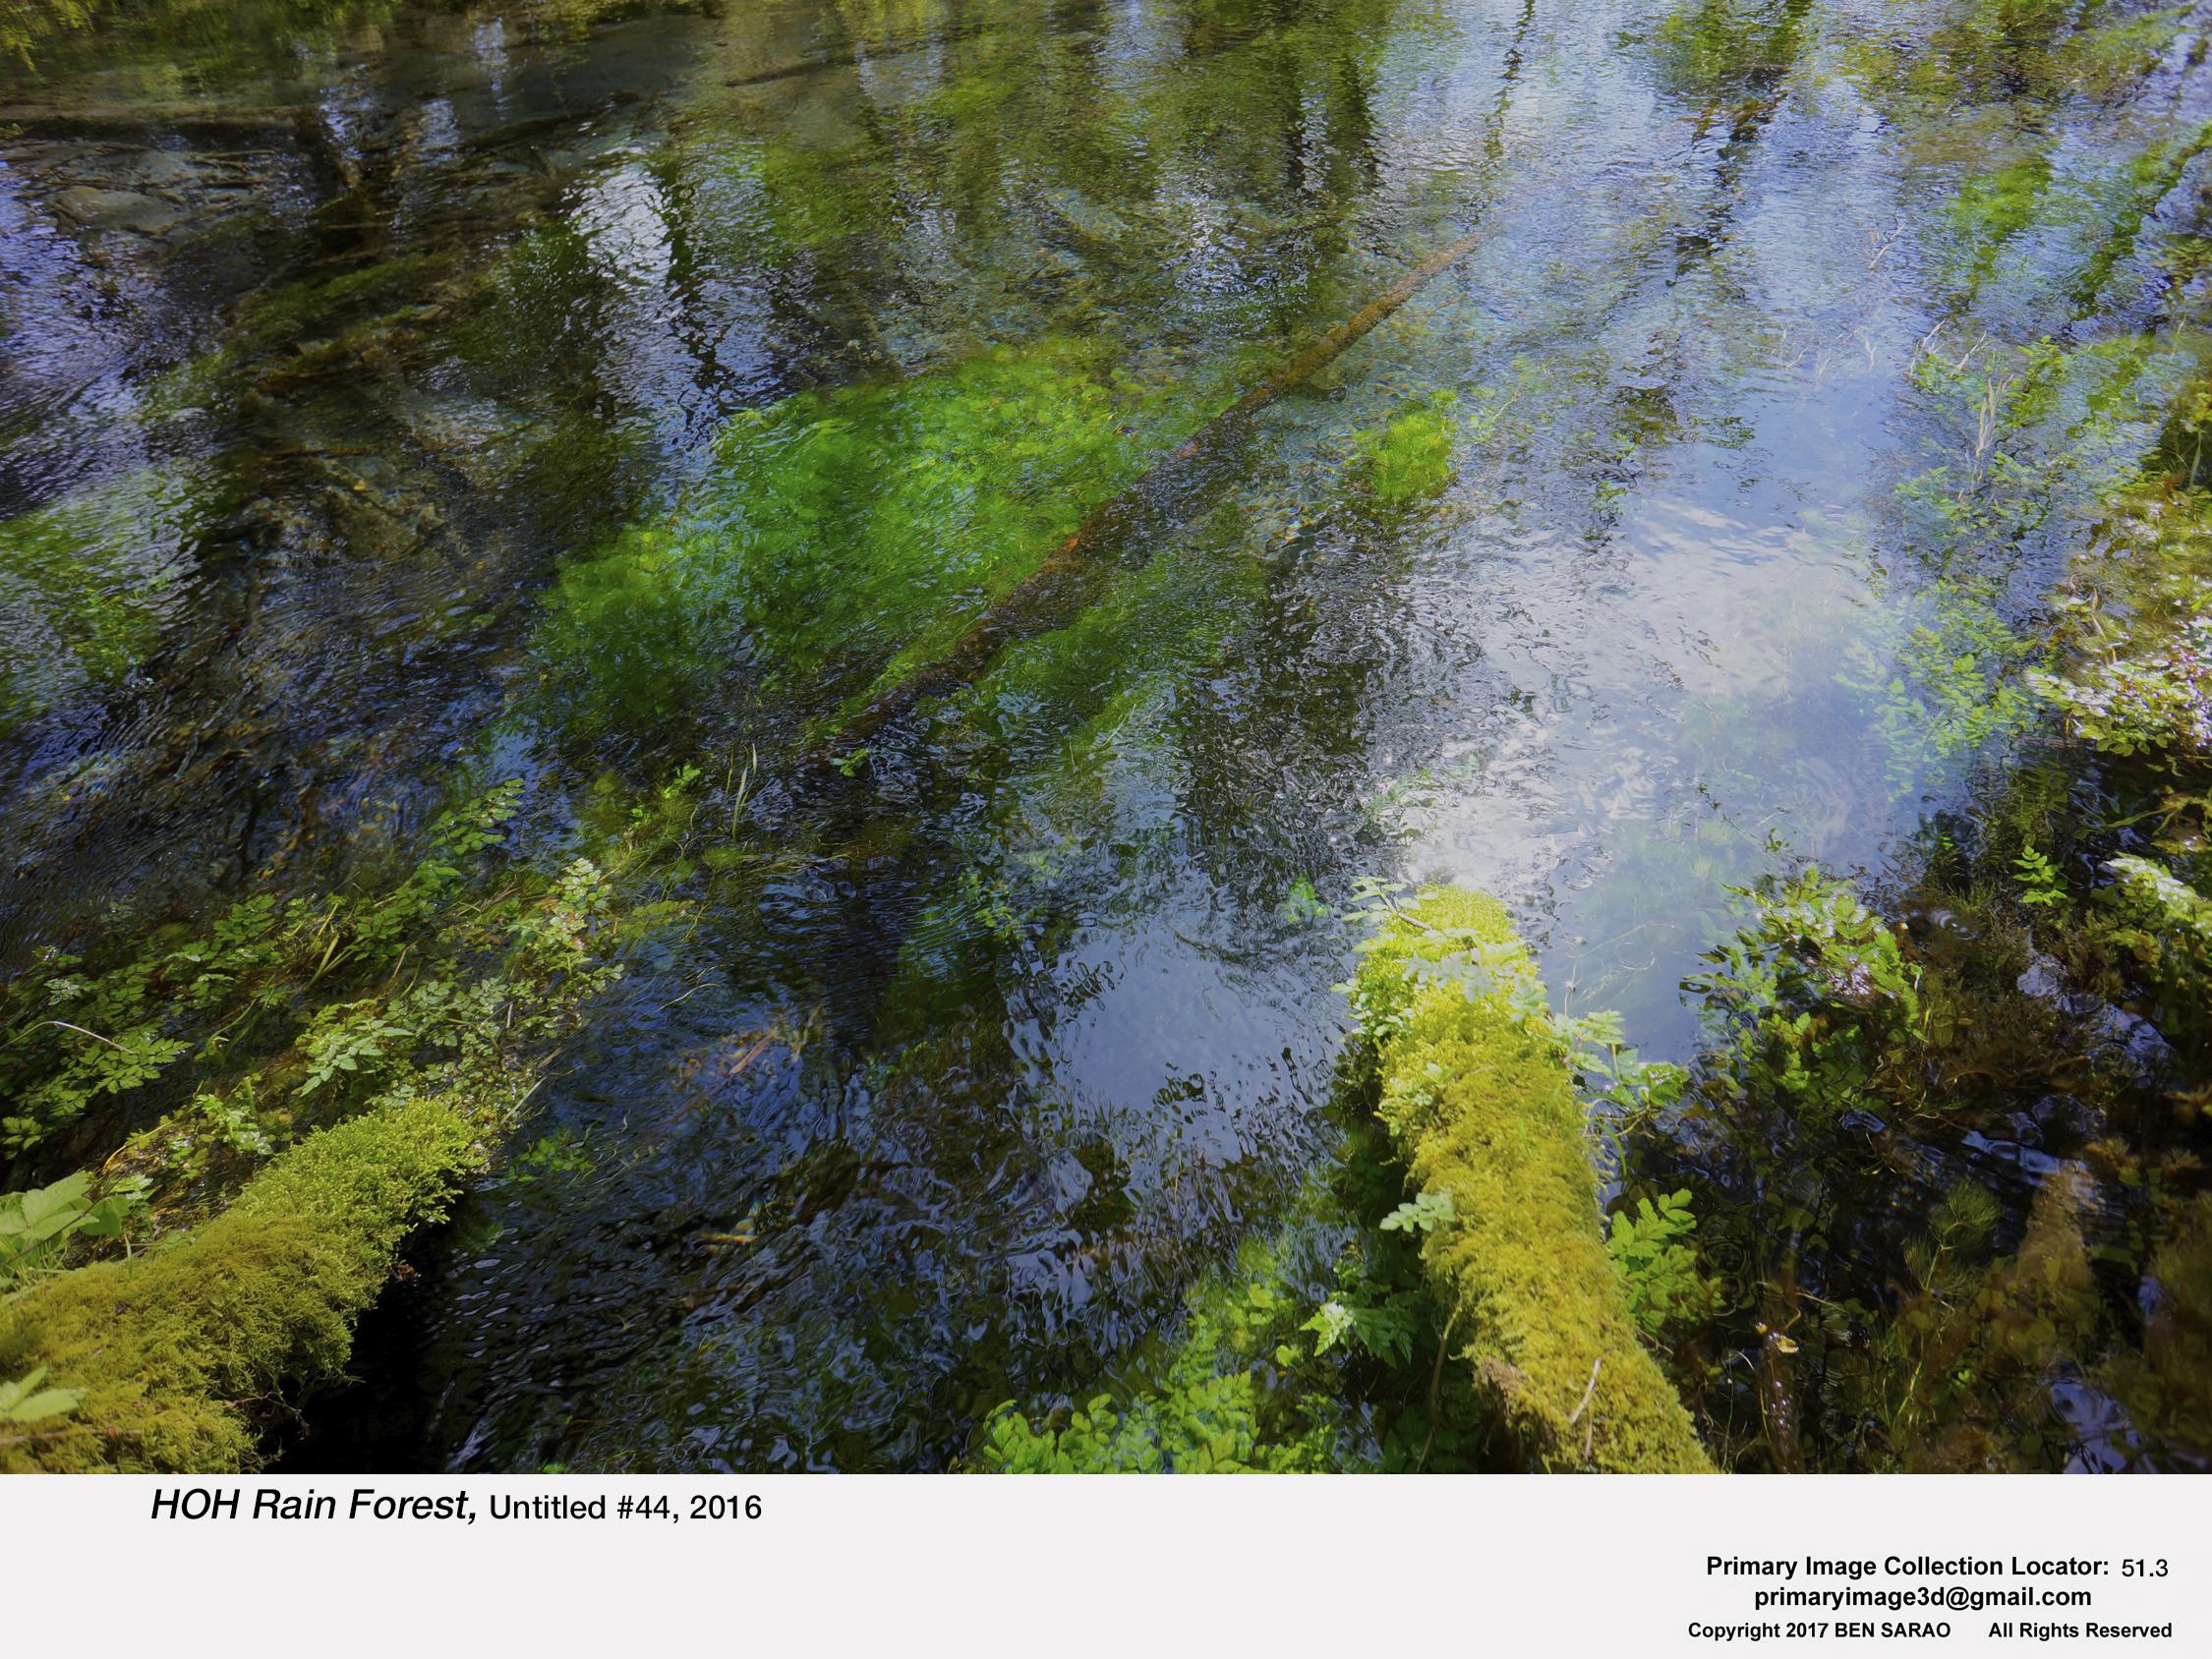 1. HOH Rain Forest 44.jpg